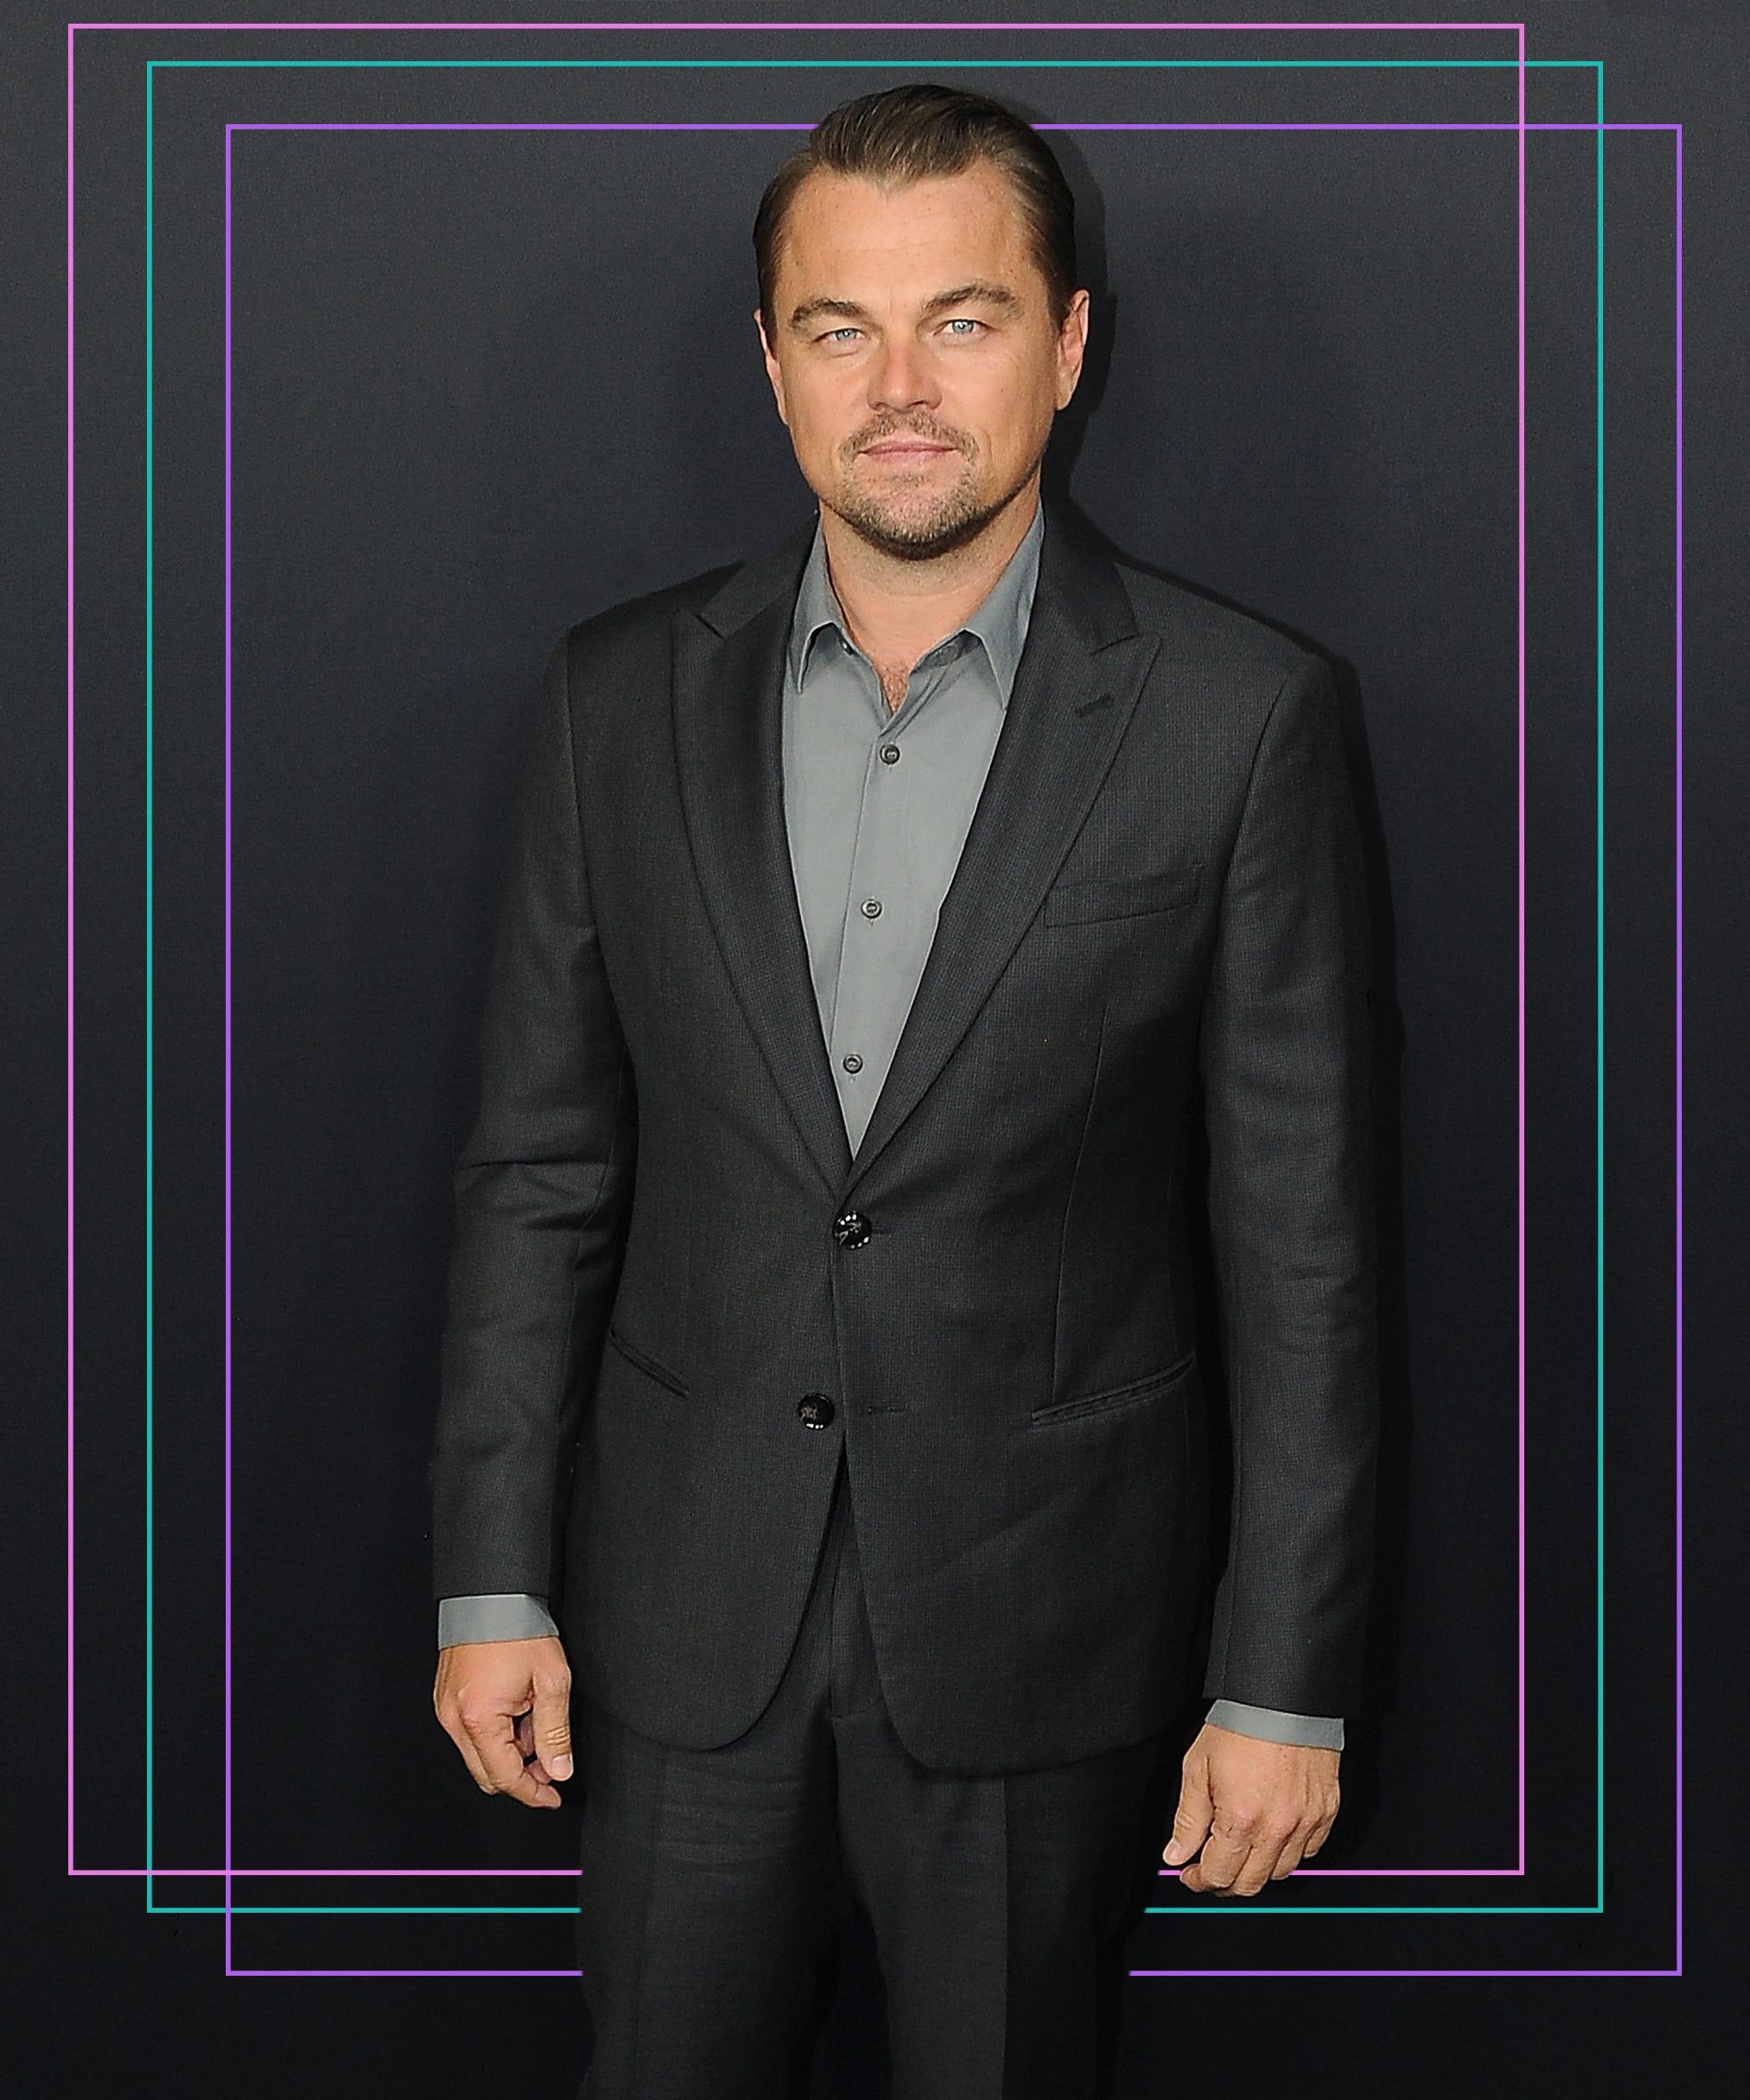 Leonardo DiCaprio Shares His One-Of-A-Kind Take On Tacos